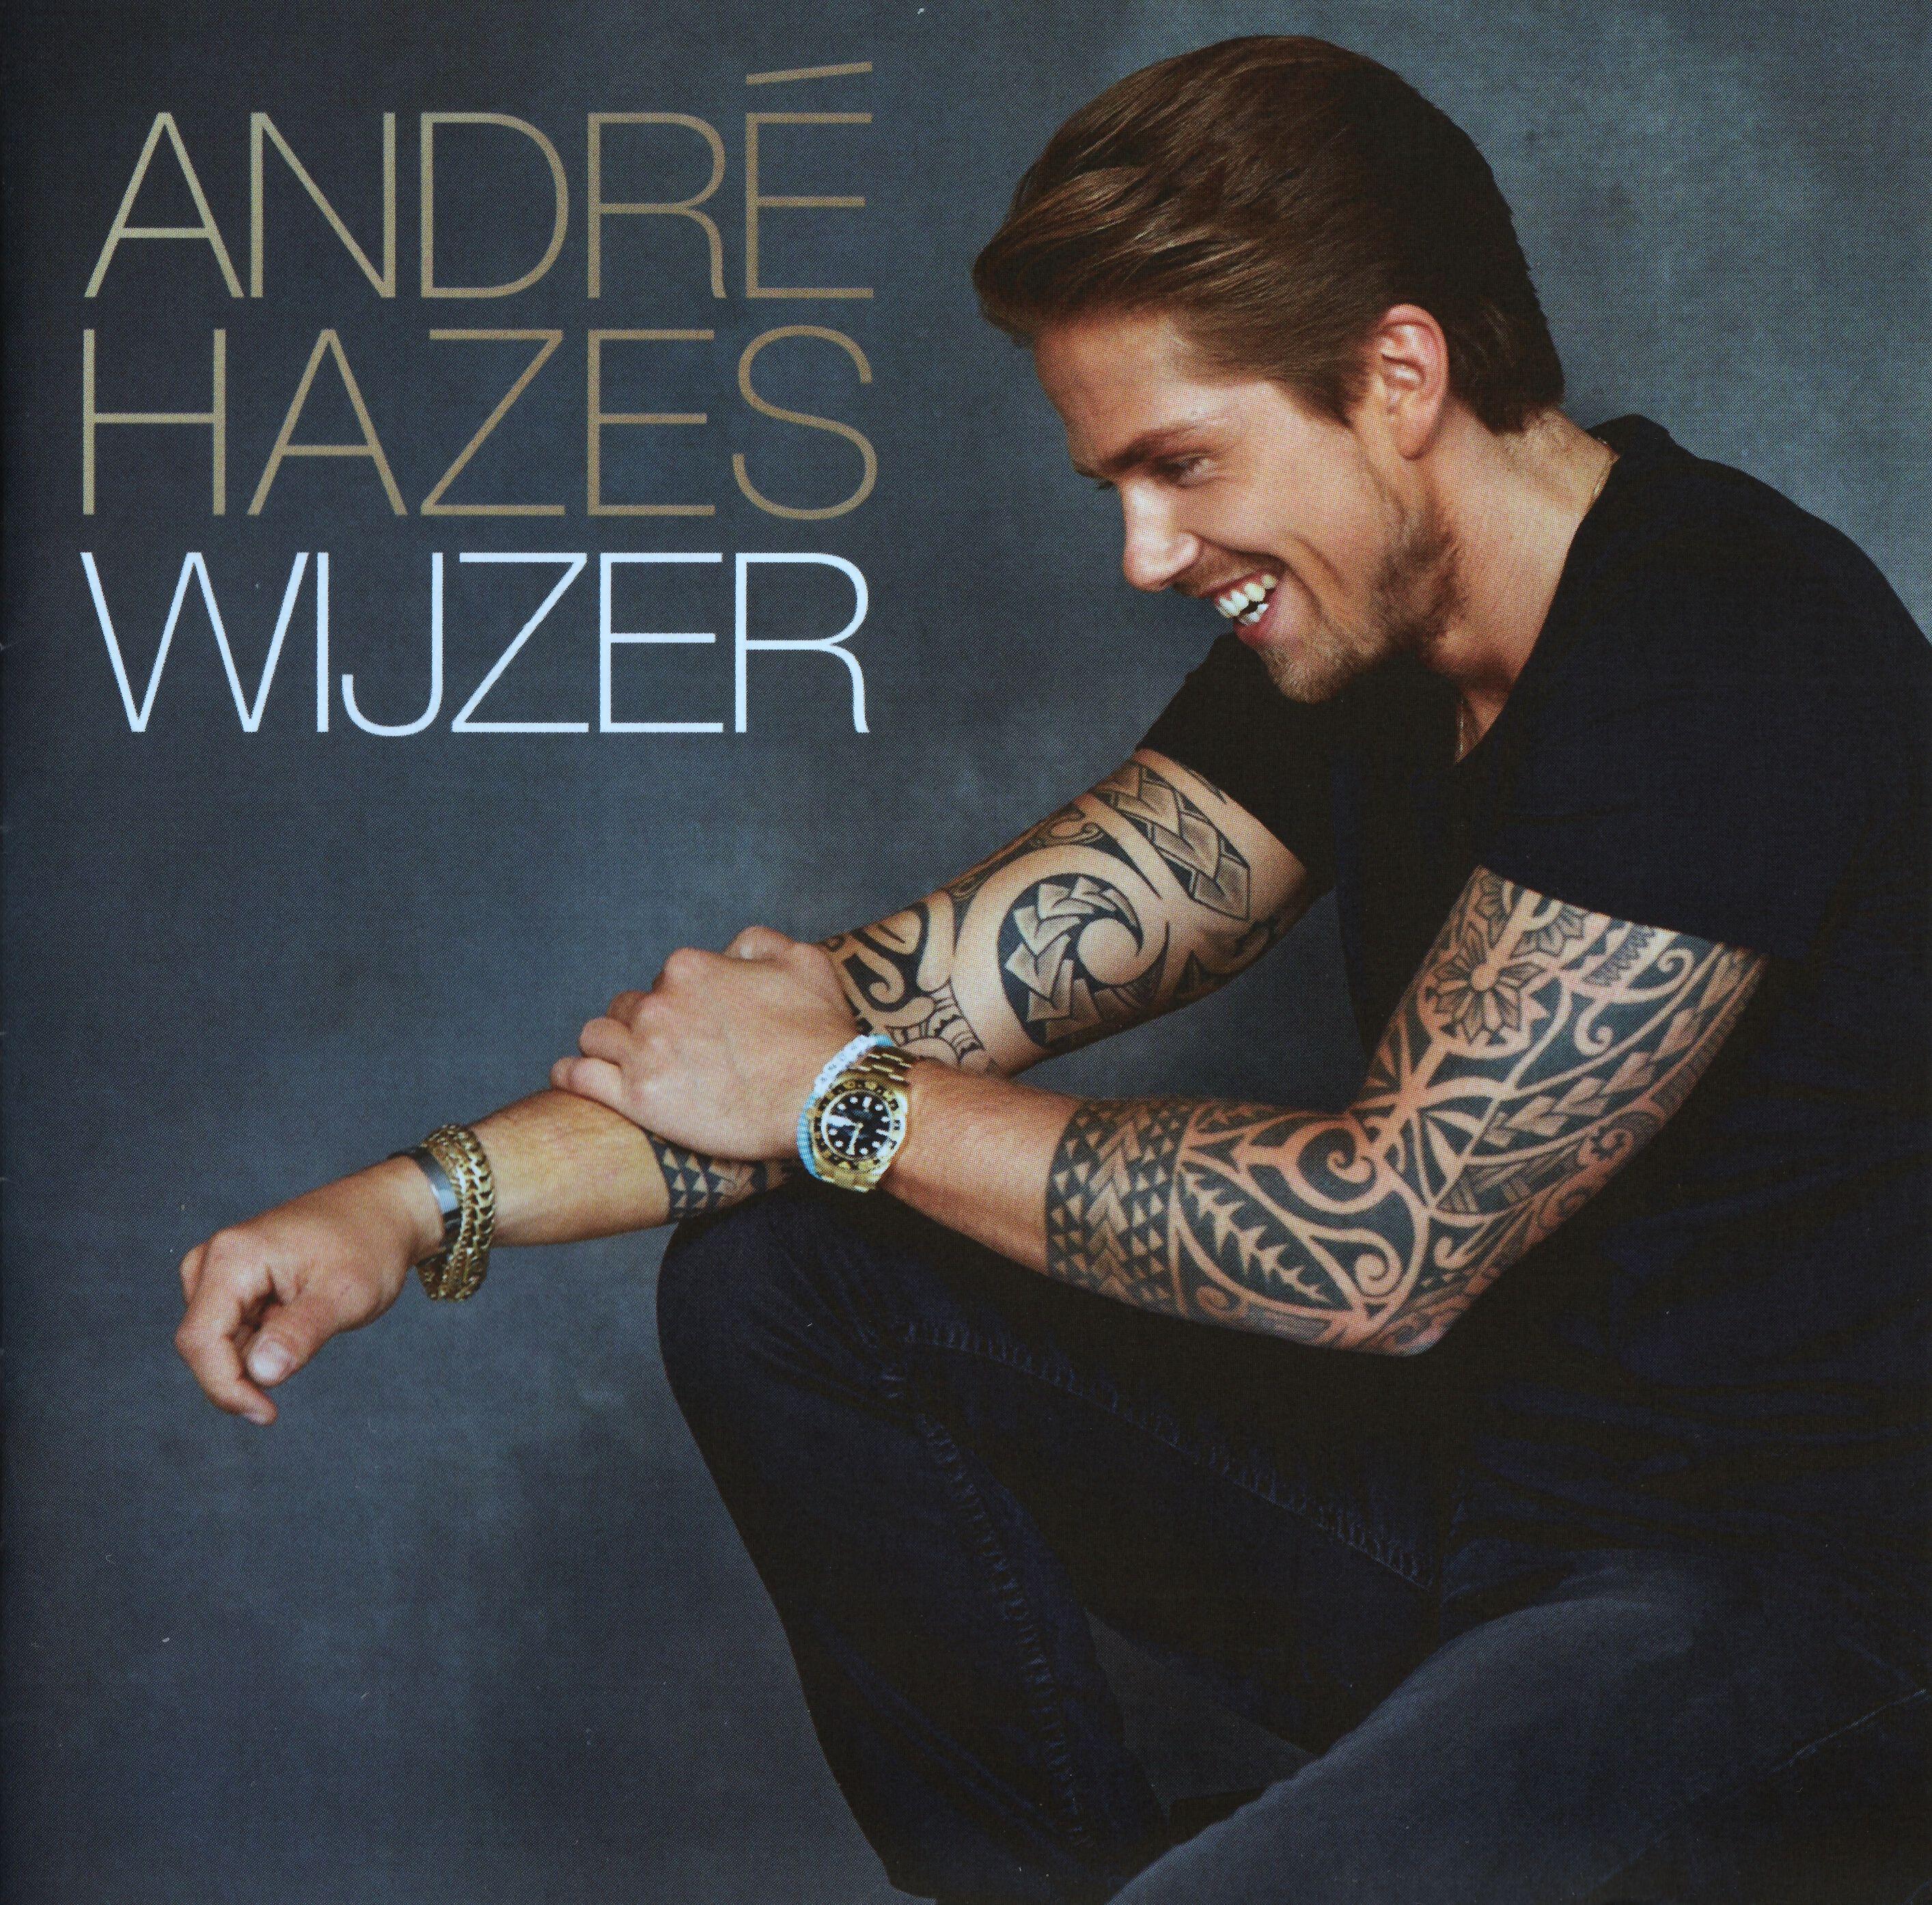 André Hazes Jr. - Wijzer album cover